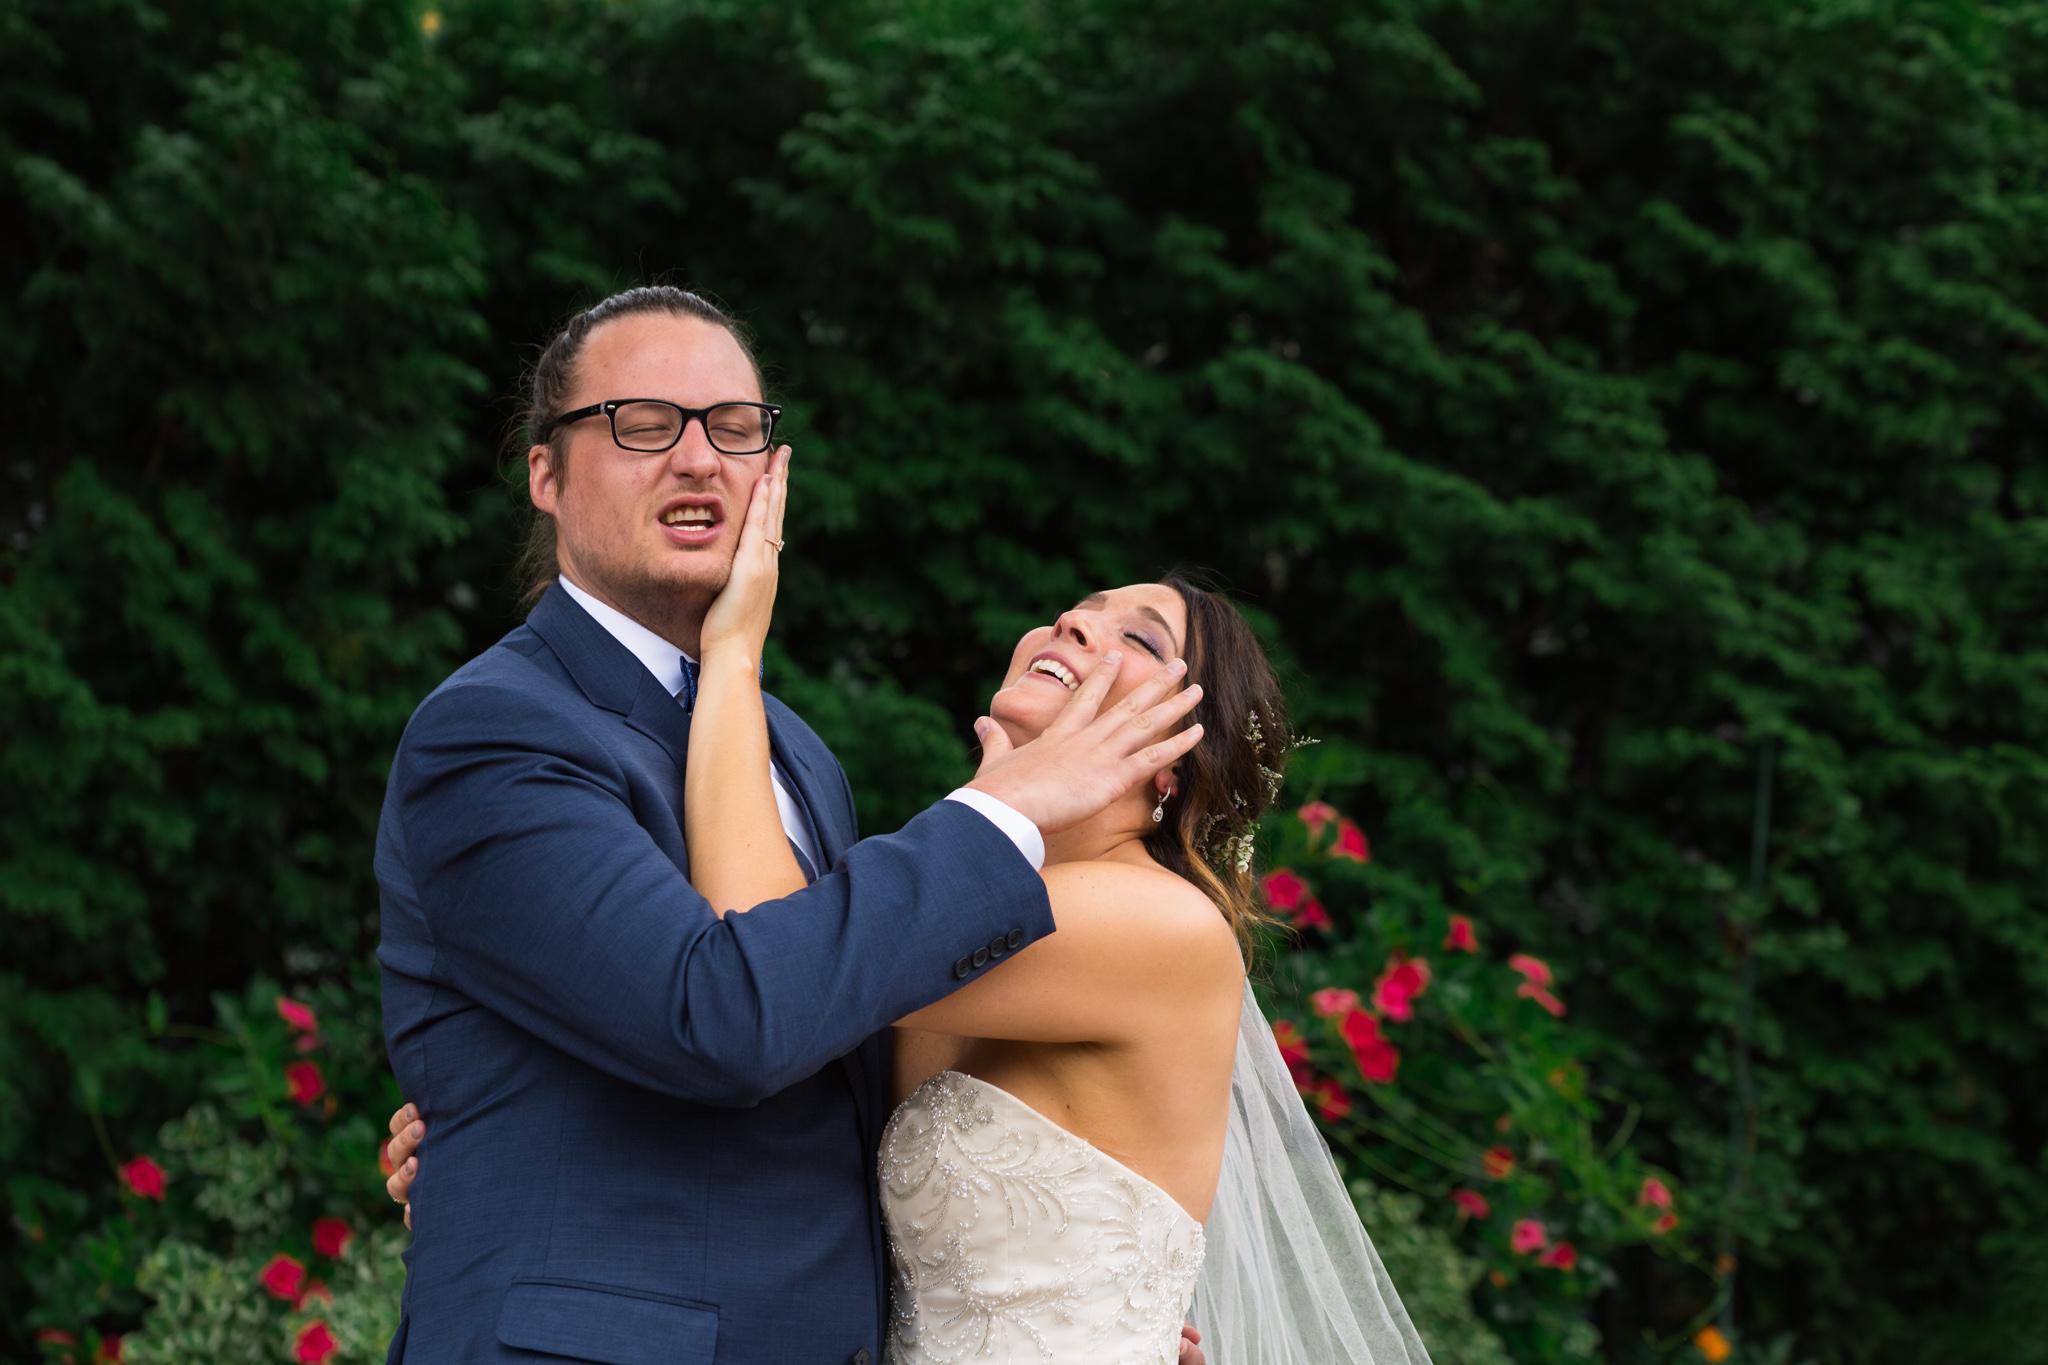 Ce Moment Photography Ohio Wedding Photographer Destination Wedding Photographer10.jpg